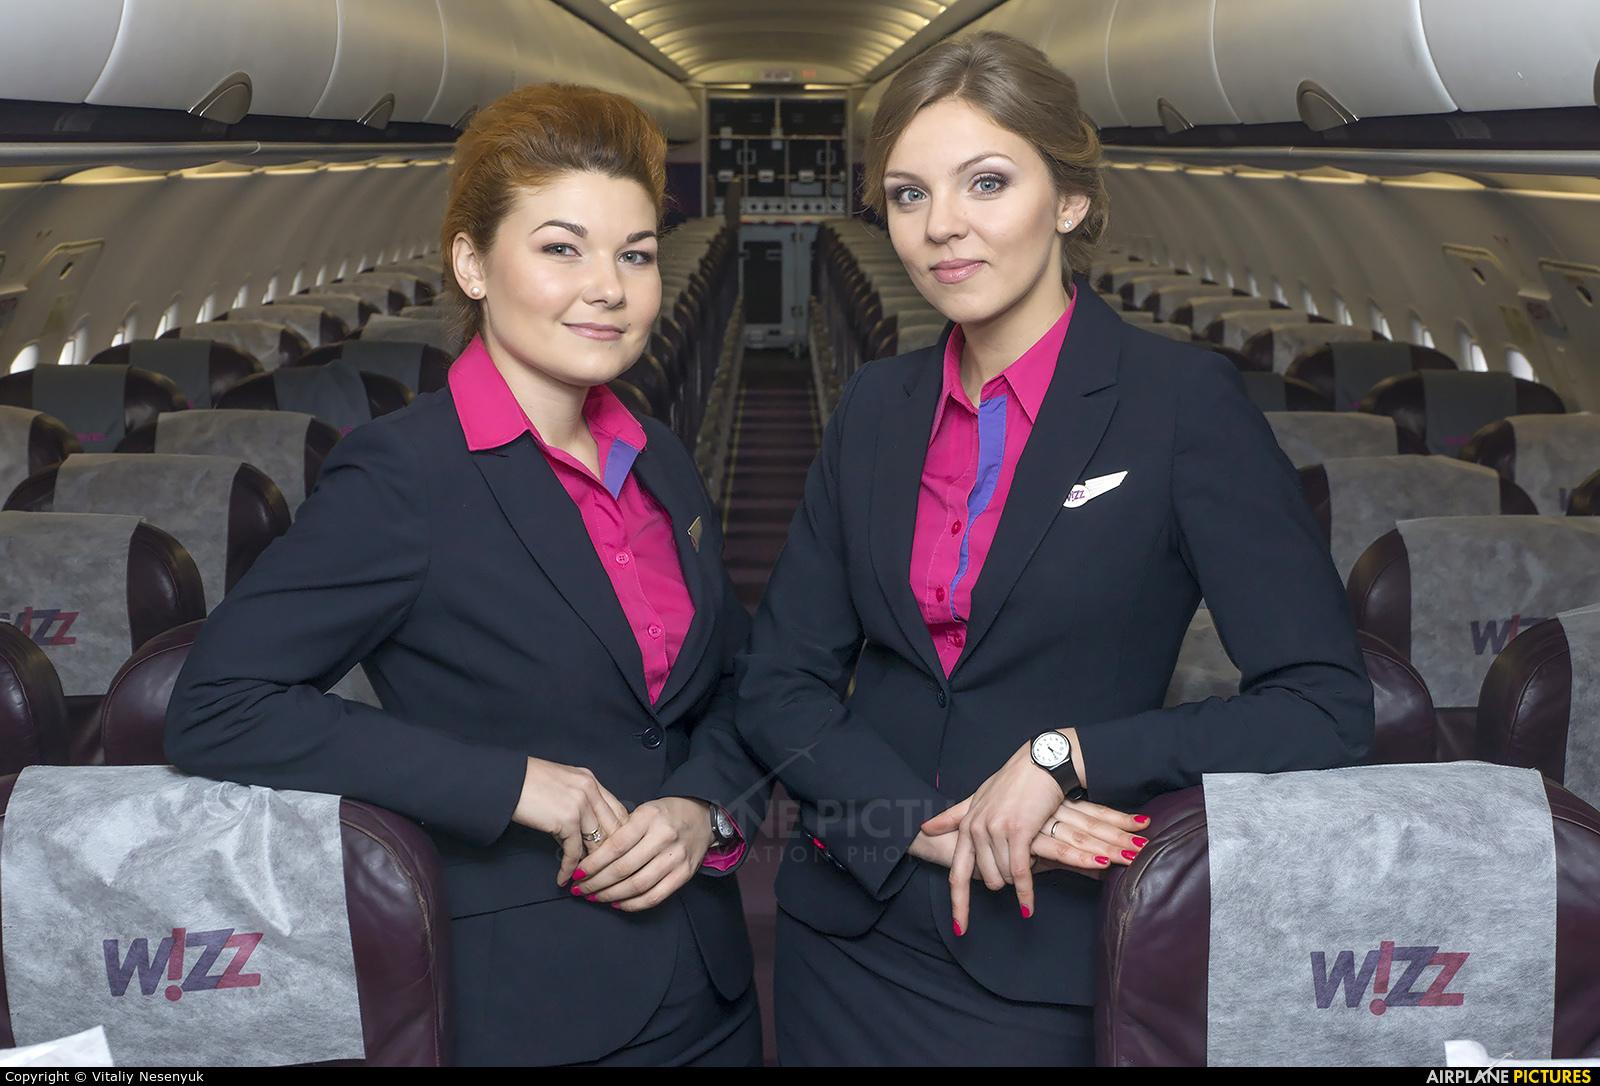 Wizz Air UR-WUA aircraft at Kyiv - Zhulyany